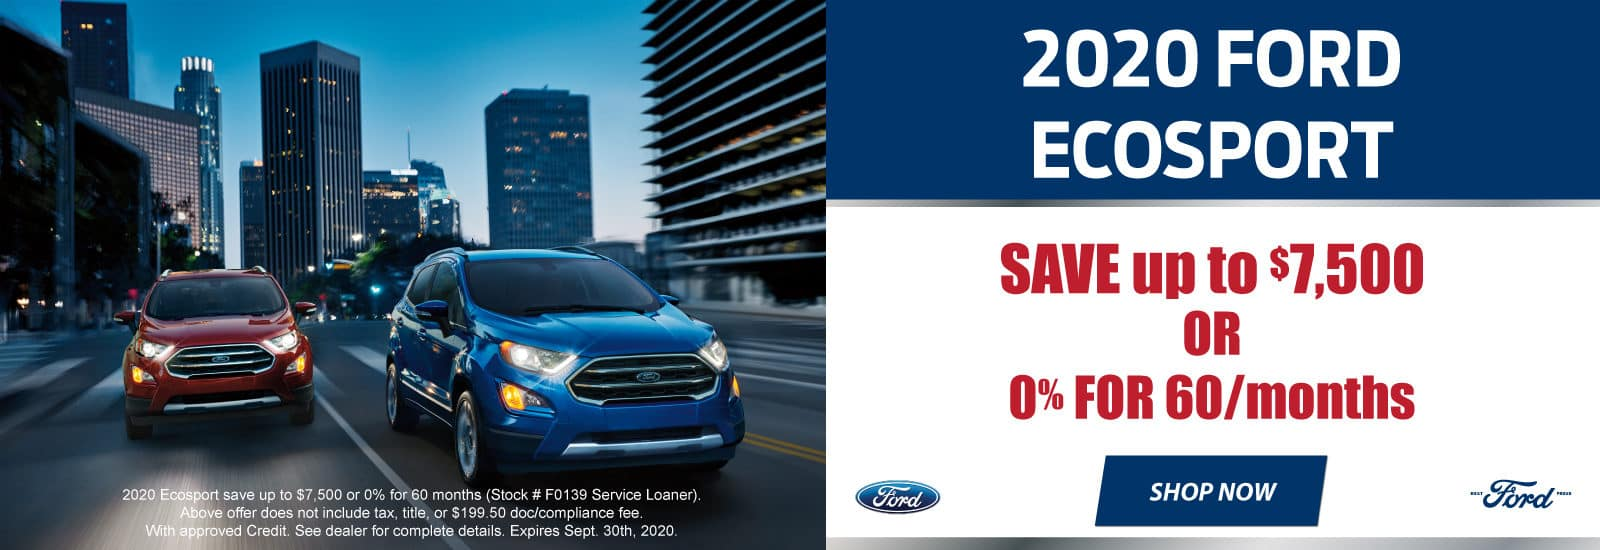 2020-Ford-Ecosport-Web-Banner-1600×550